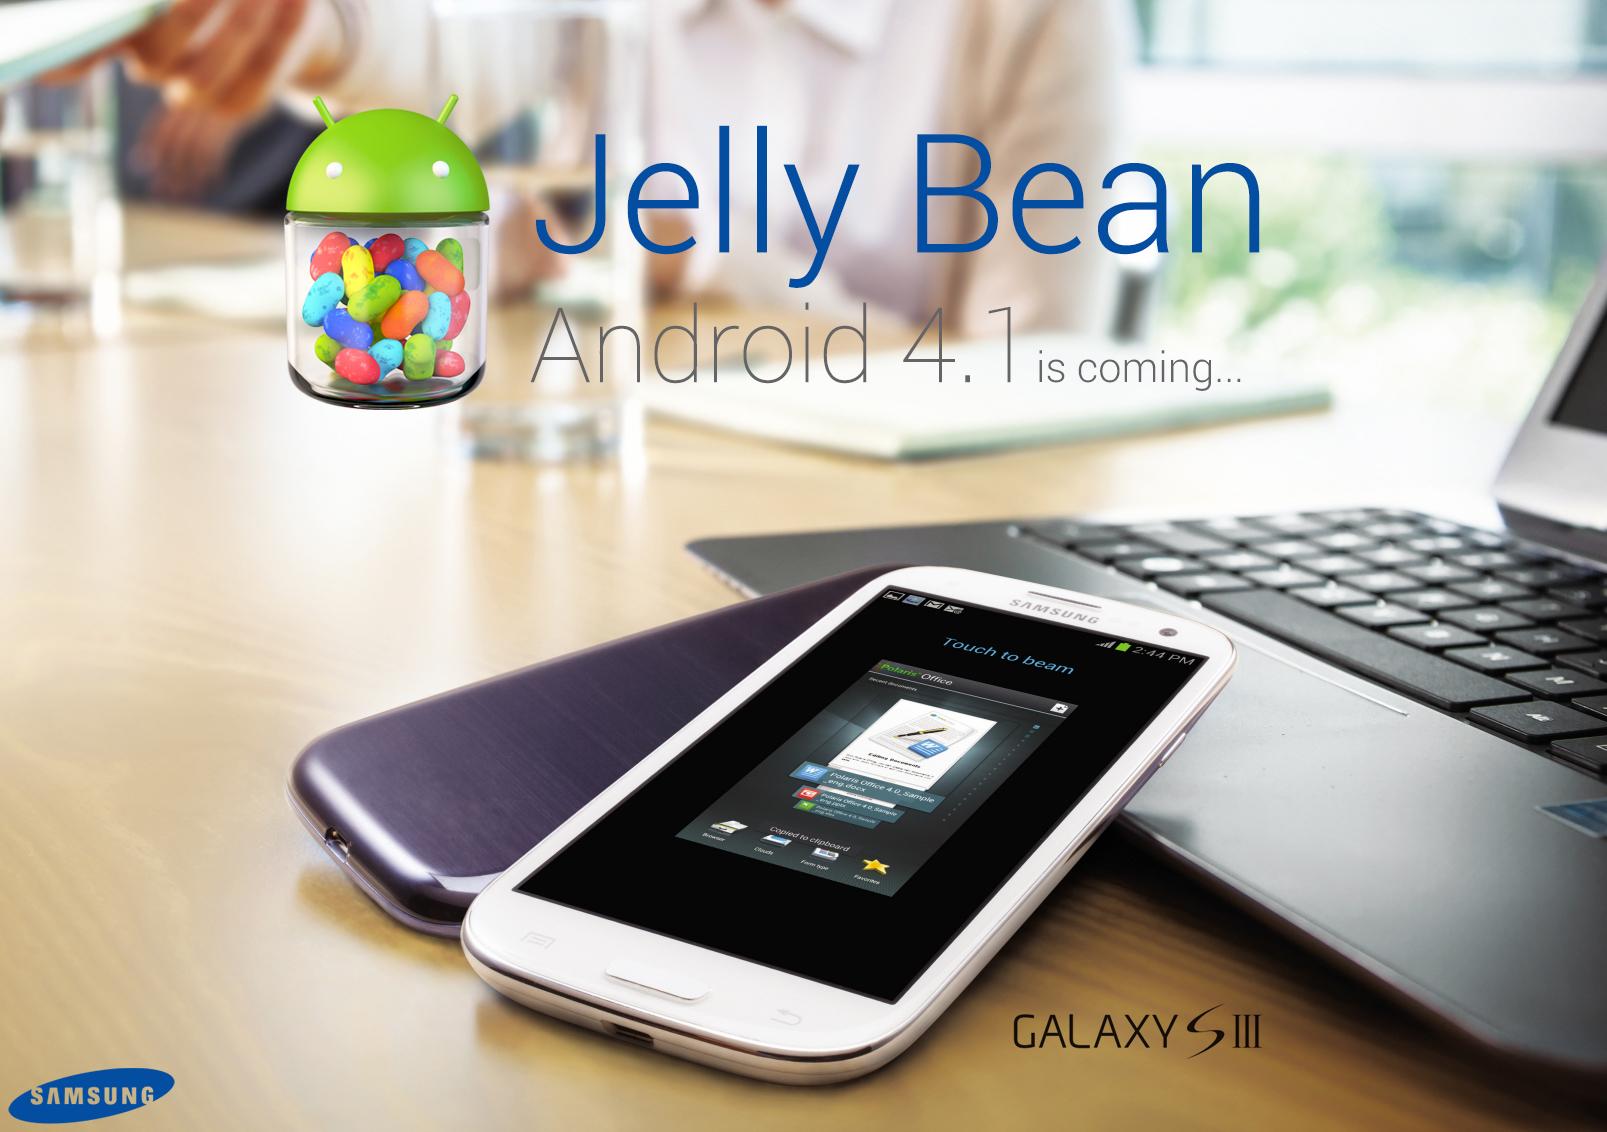 Galaxy S III 4.1.1 Update